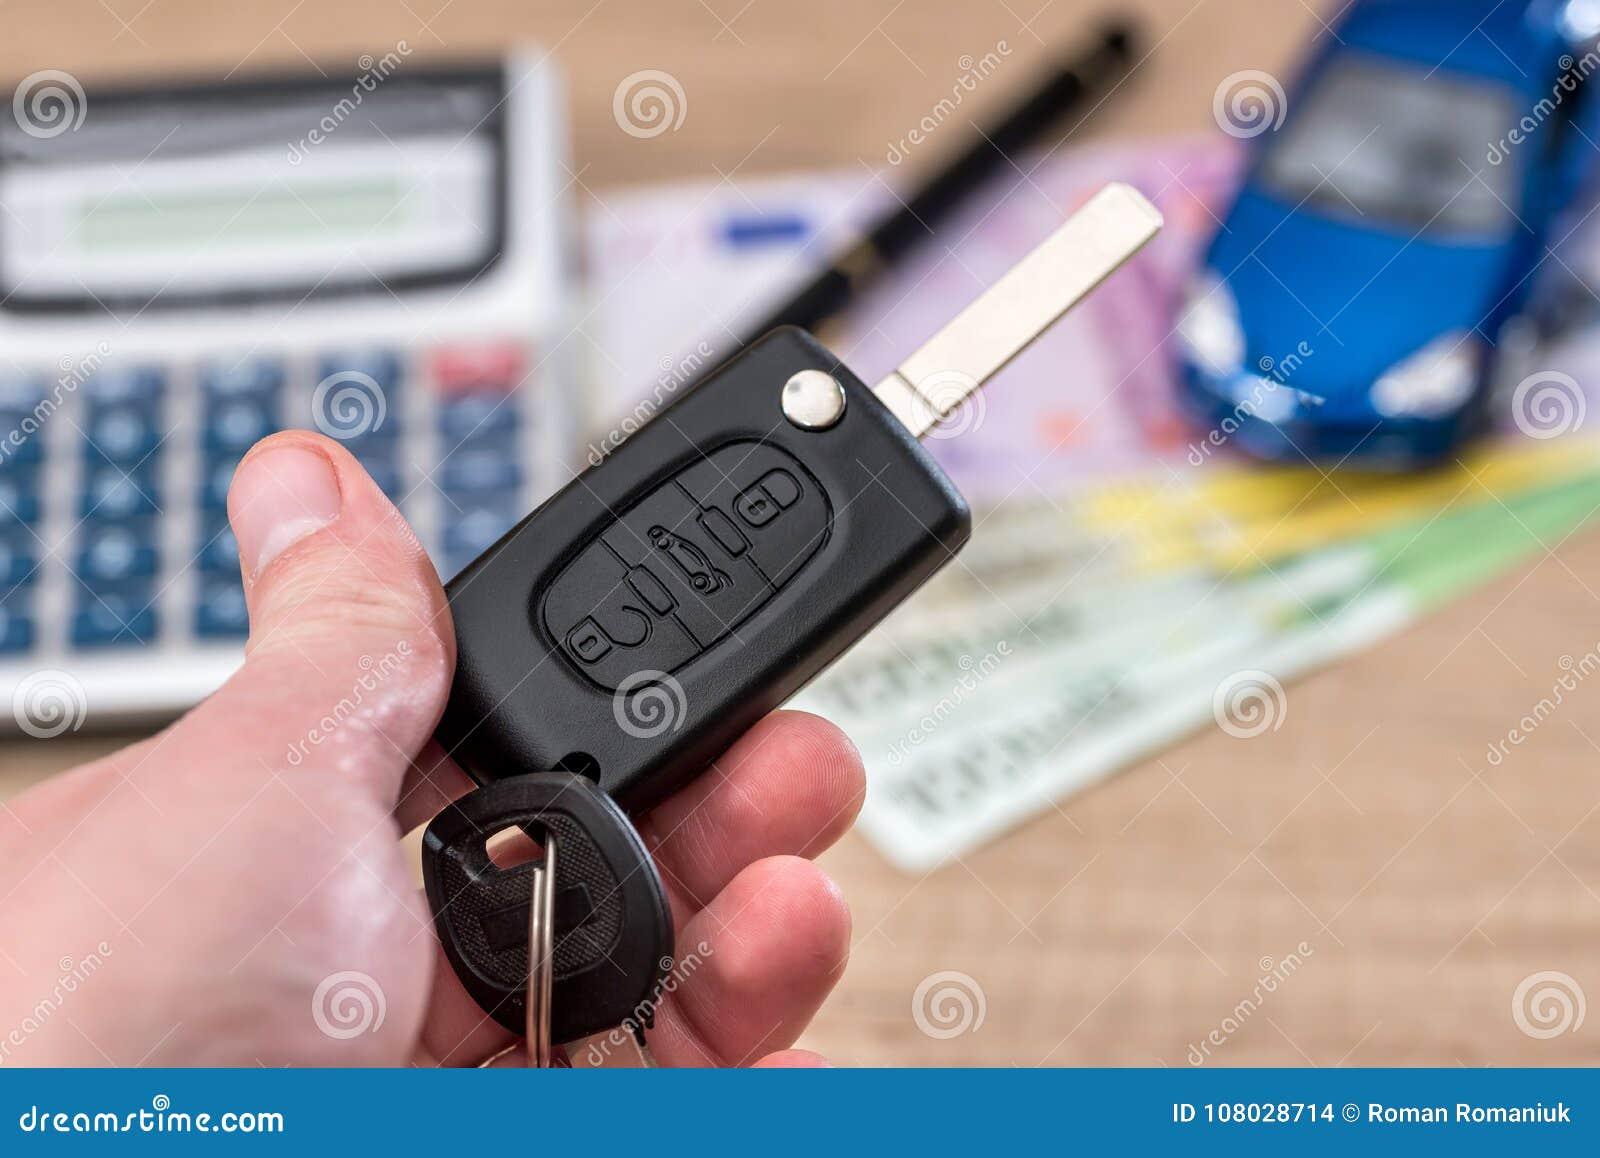 Car Key Toy Car Euro Bills Stock Photo Image Of Background